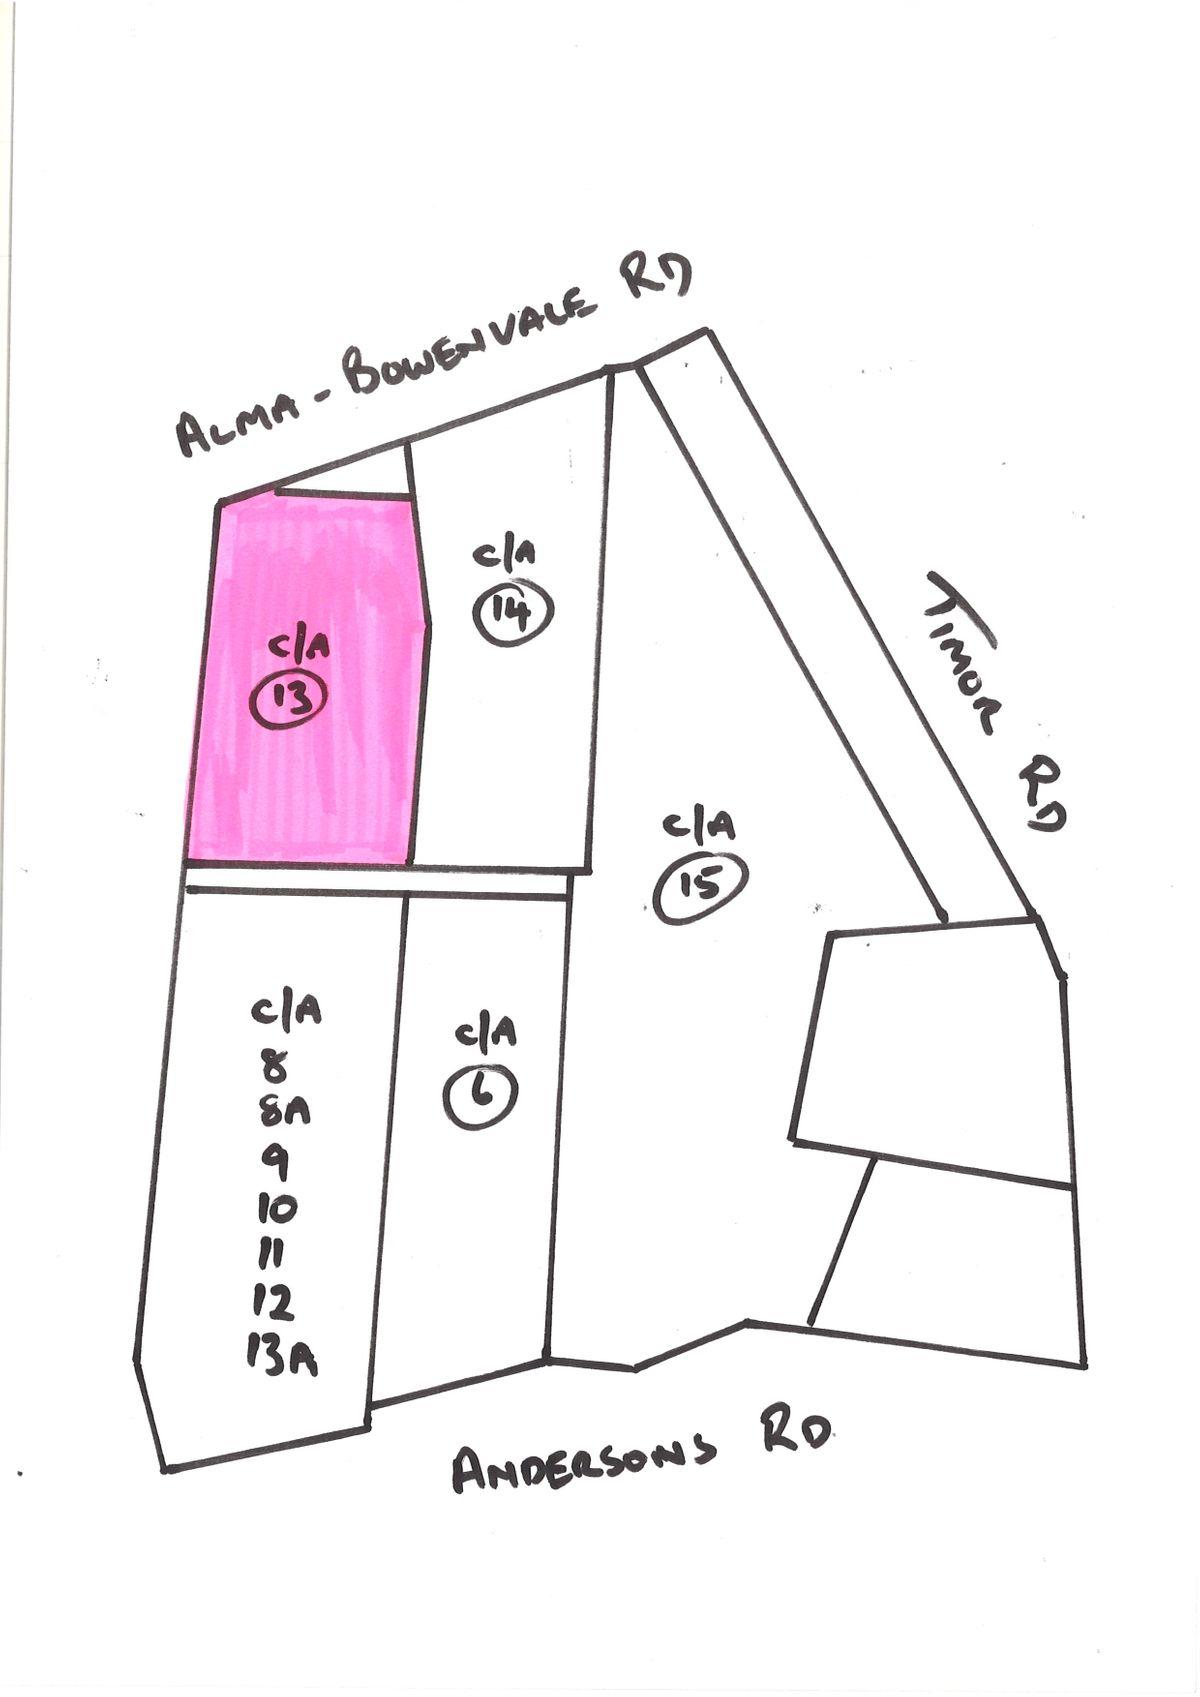 CA13 Sect 17 Alma-Bowenvale Road, Bowenvale, VIC 3465